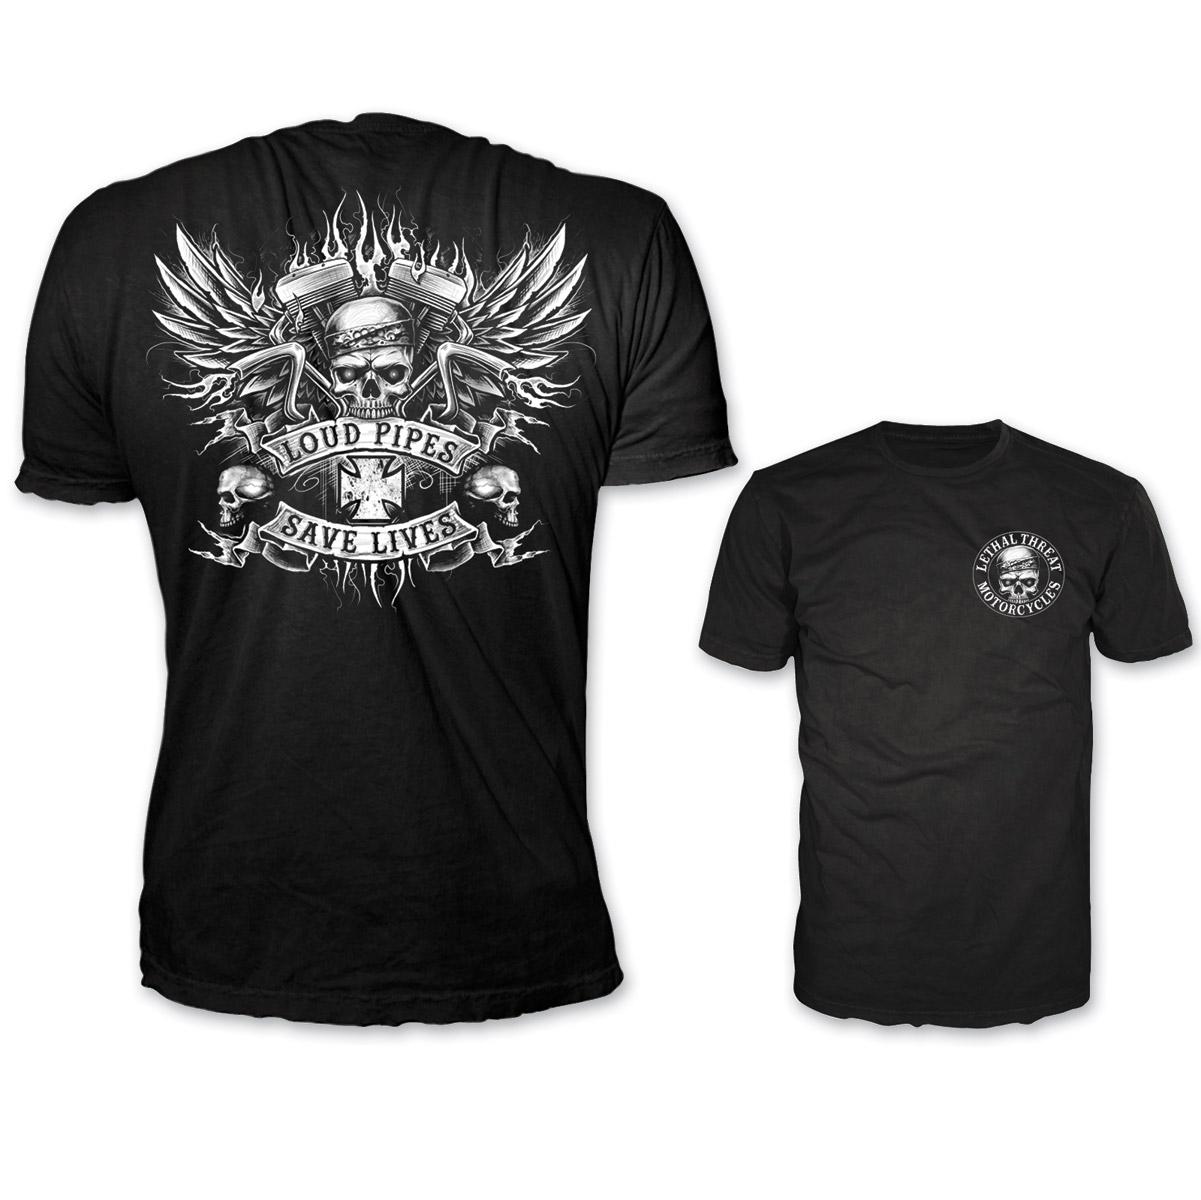 59bce28974 Lethal Threat Men's Winged Loud Pipes Black T-Shirt - LT20263-XL